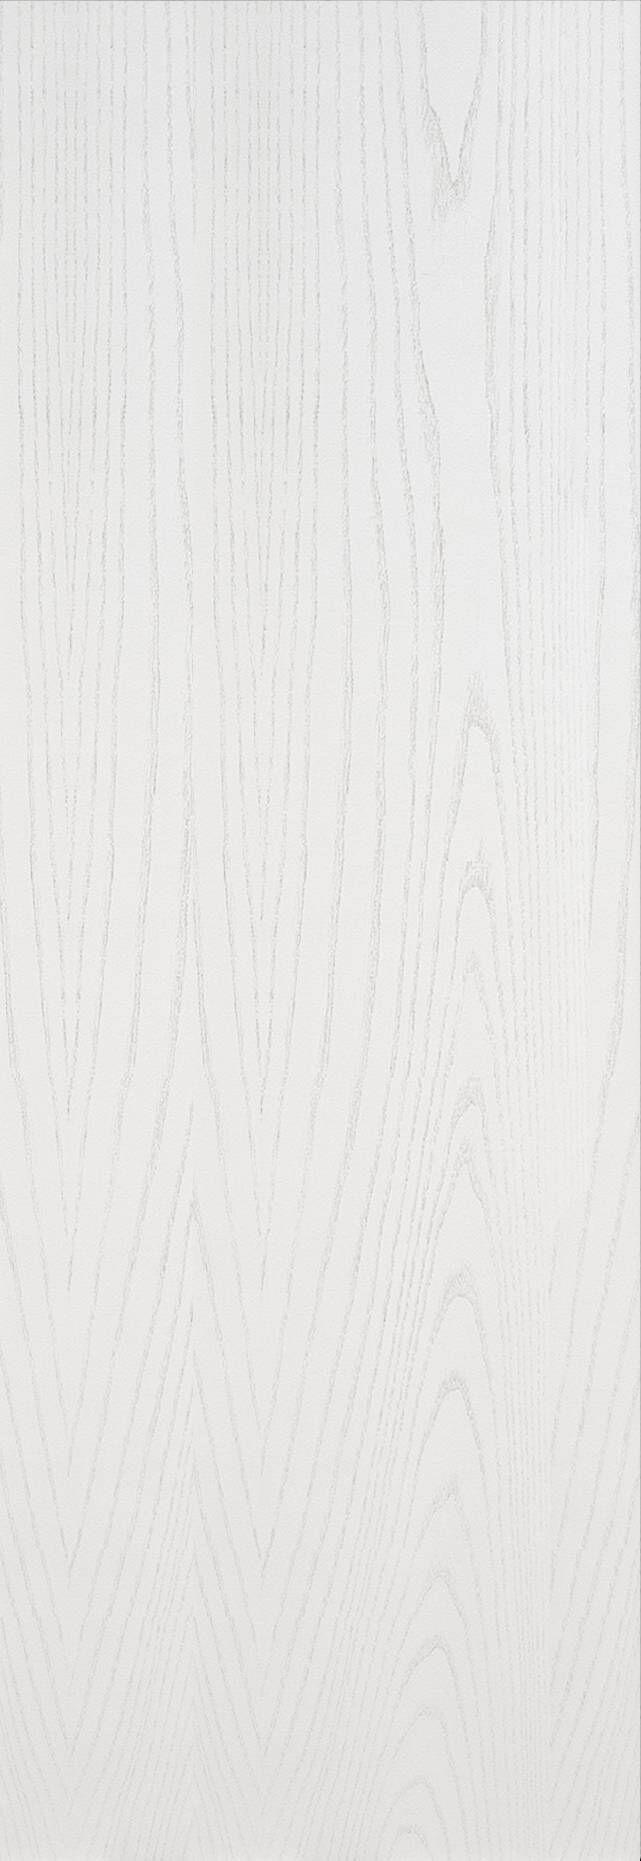 Tivoli А-1 Invisible цвет - Ясень белая эмаль Без стекла (ДГ)